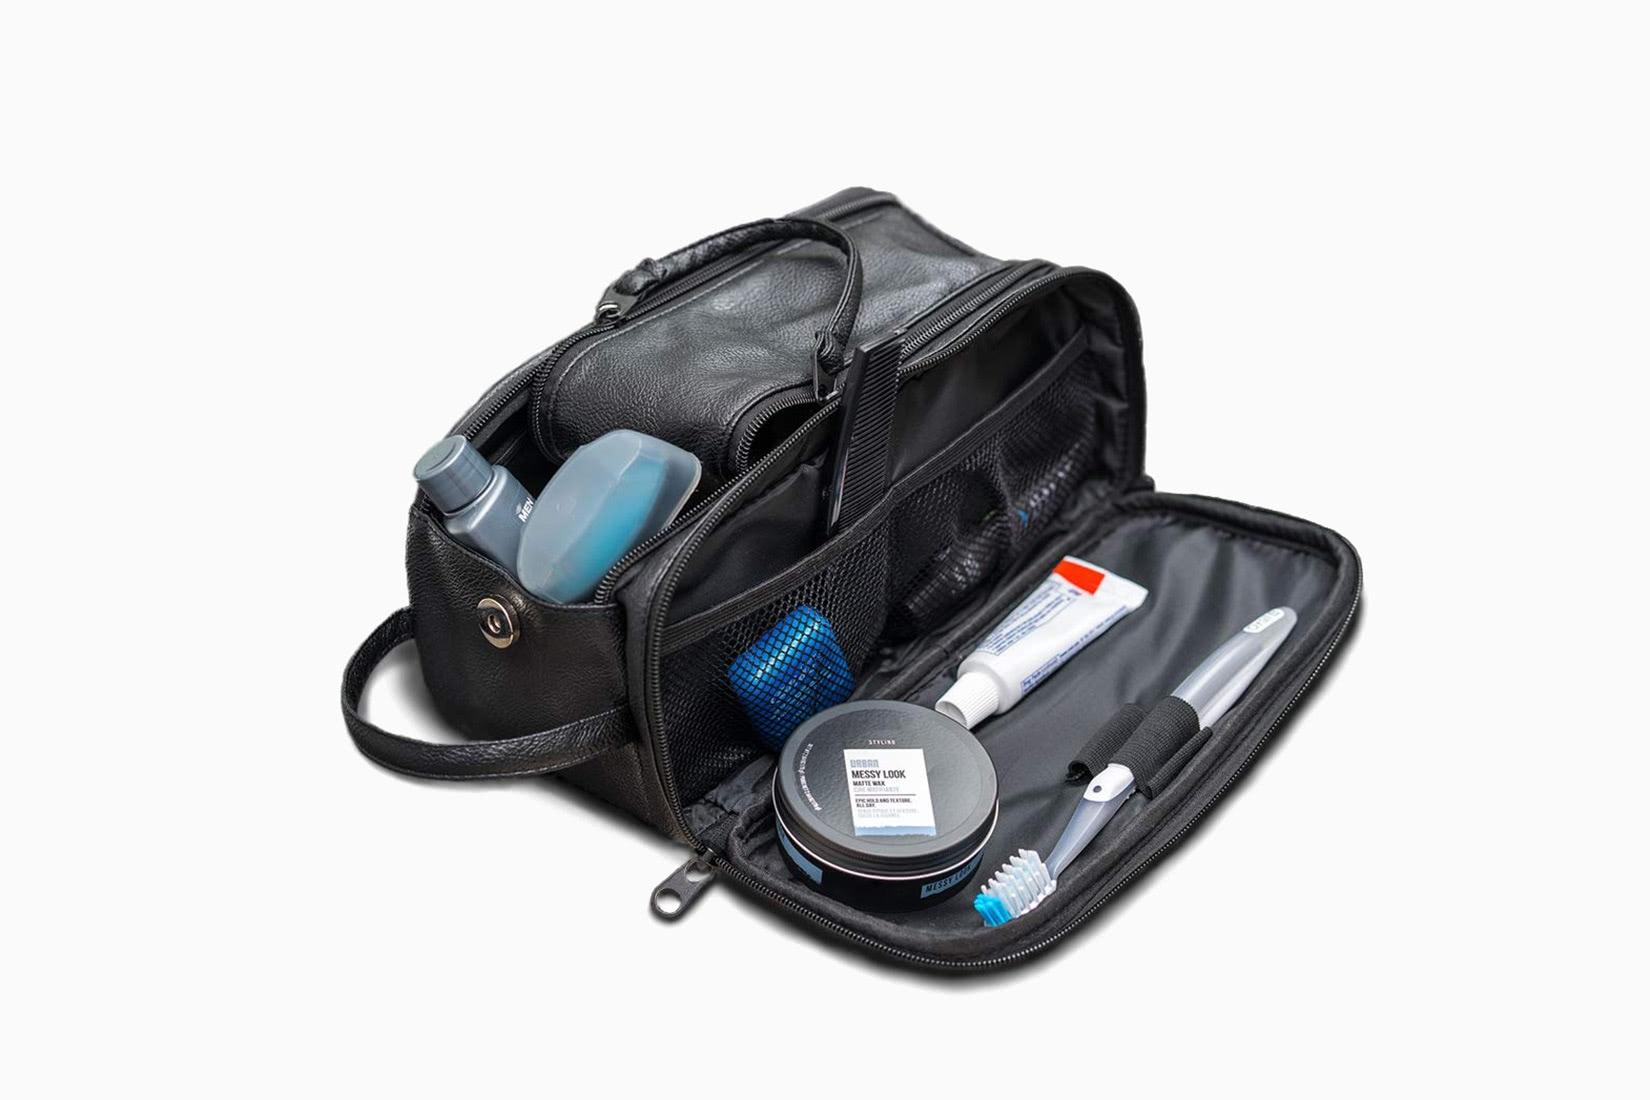 best dopp kit men large QS Leather review - Luxe Digital